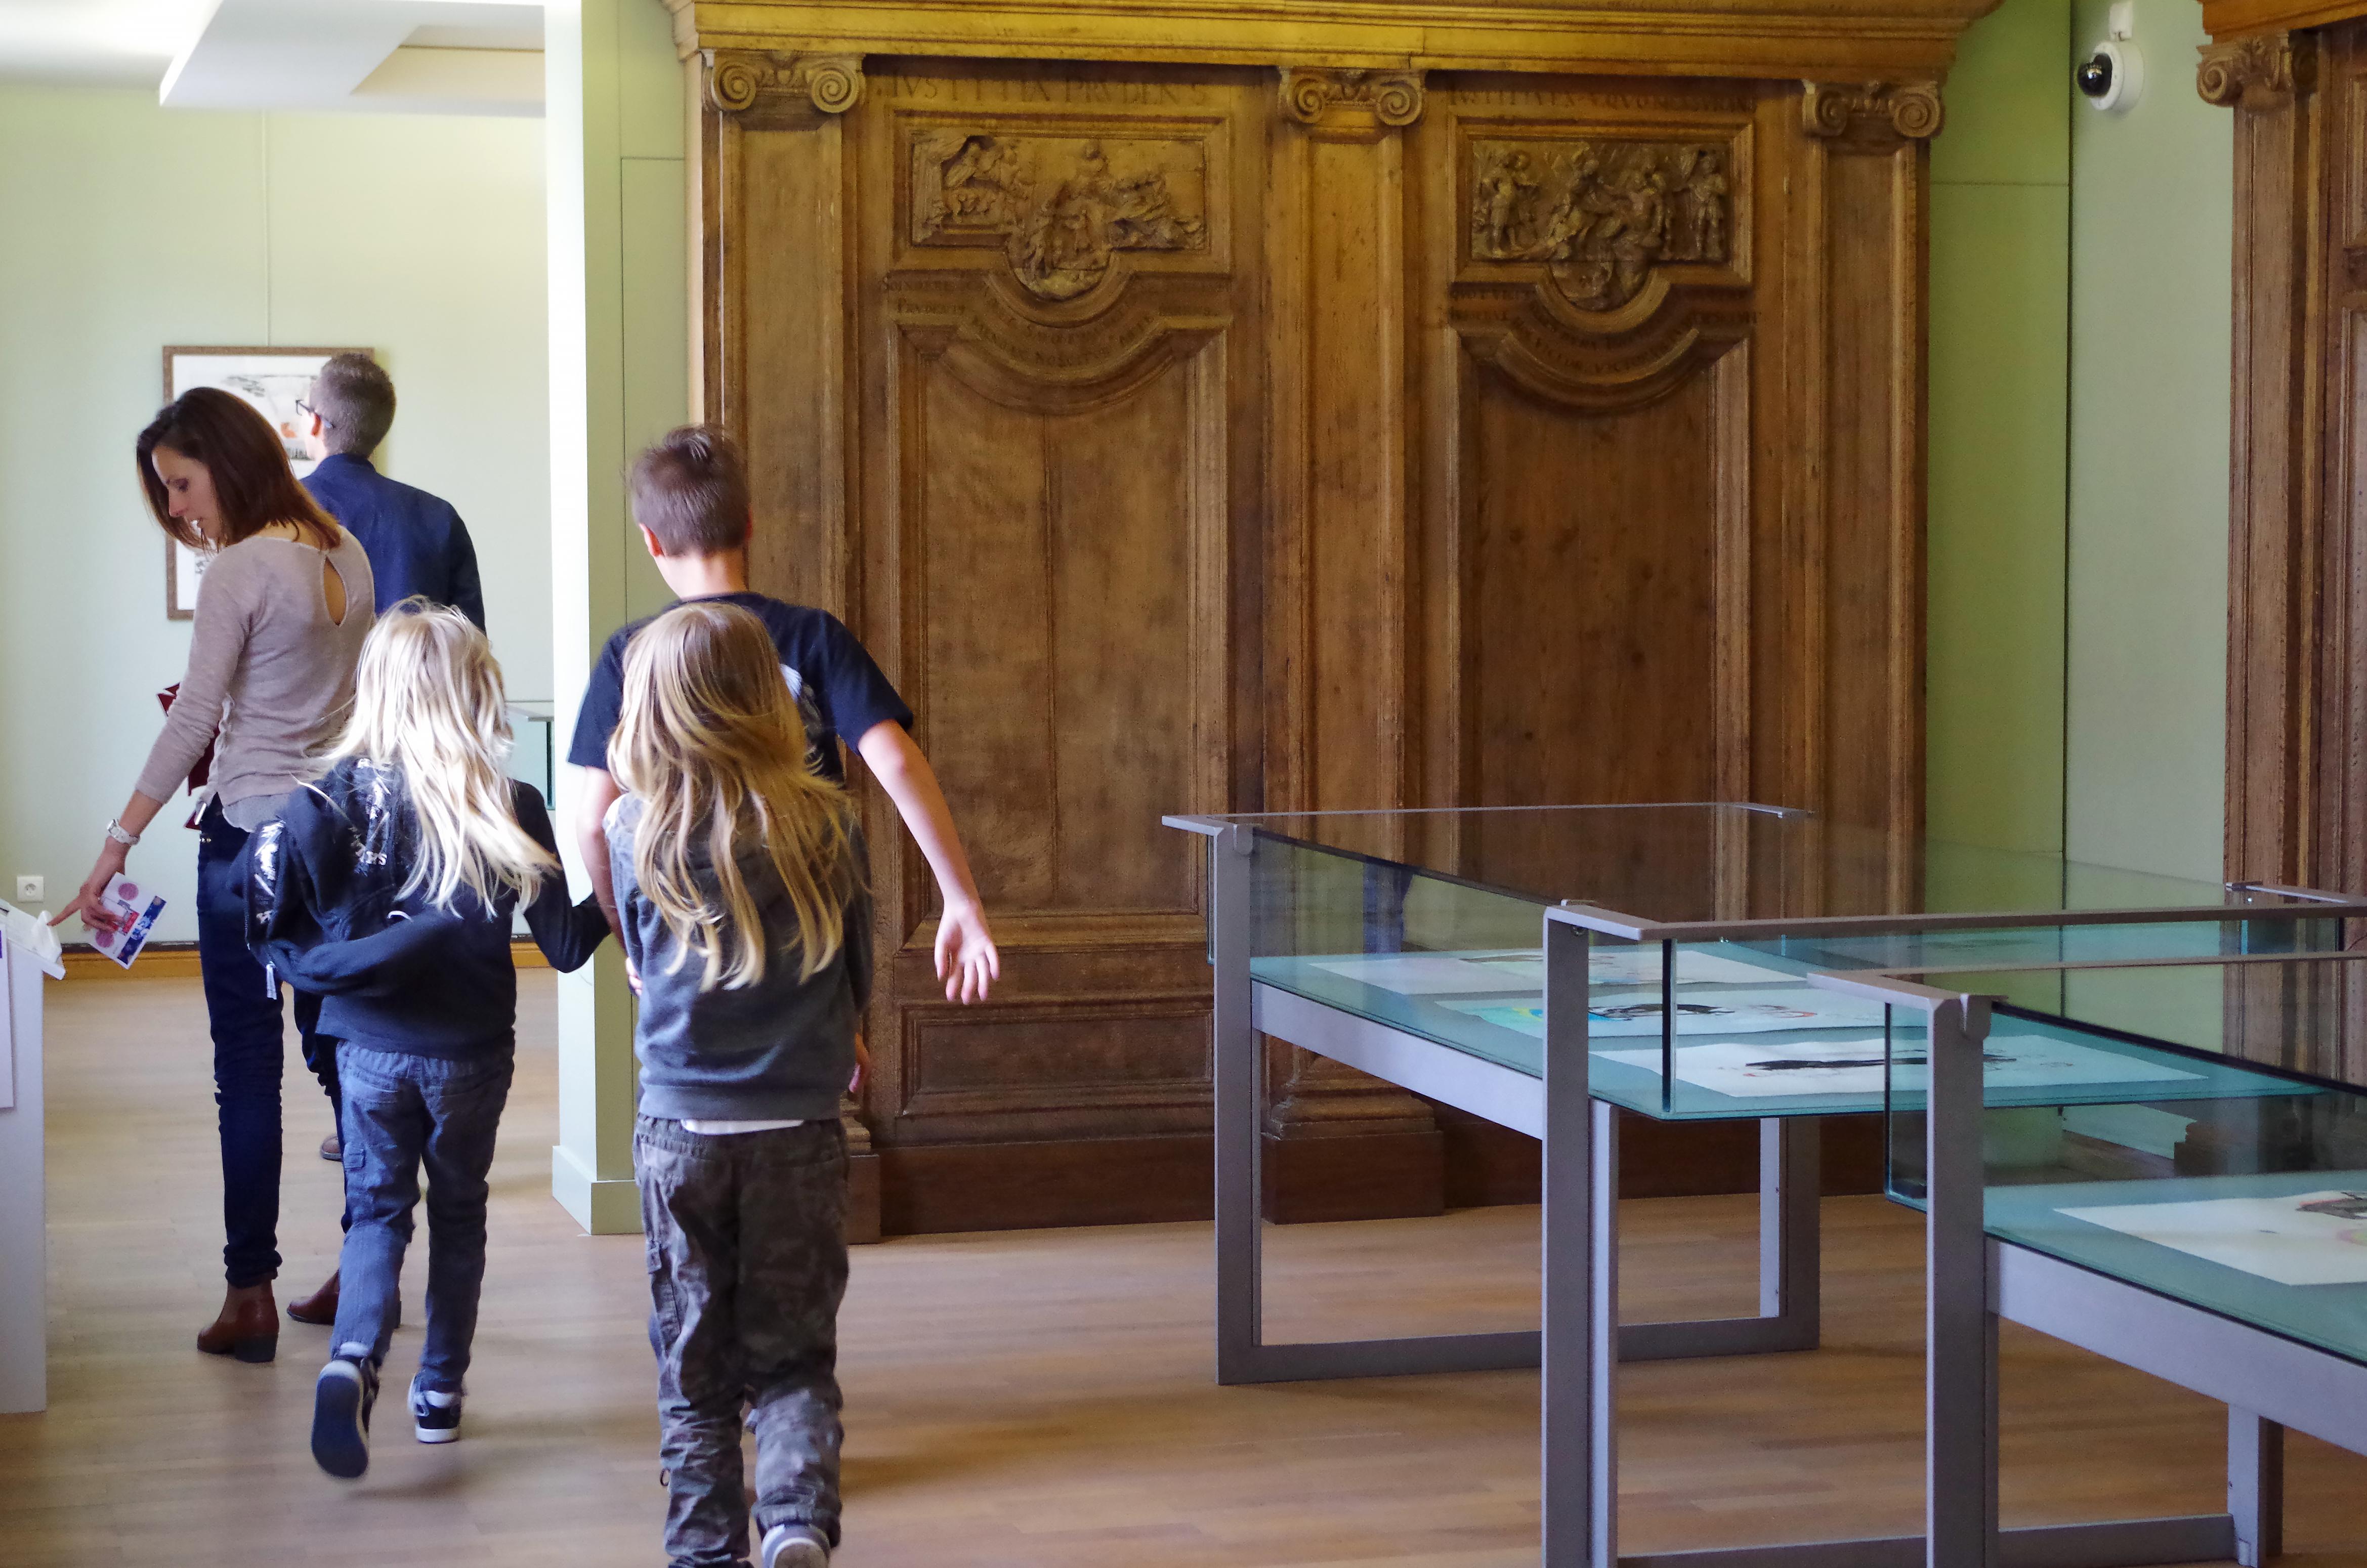 Famille en visite au musée Sandelin